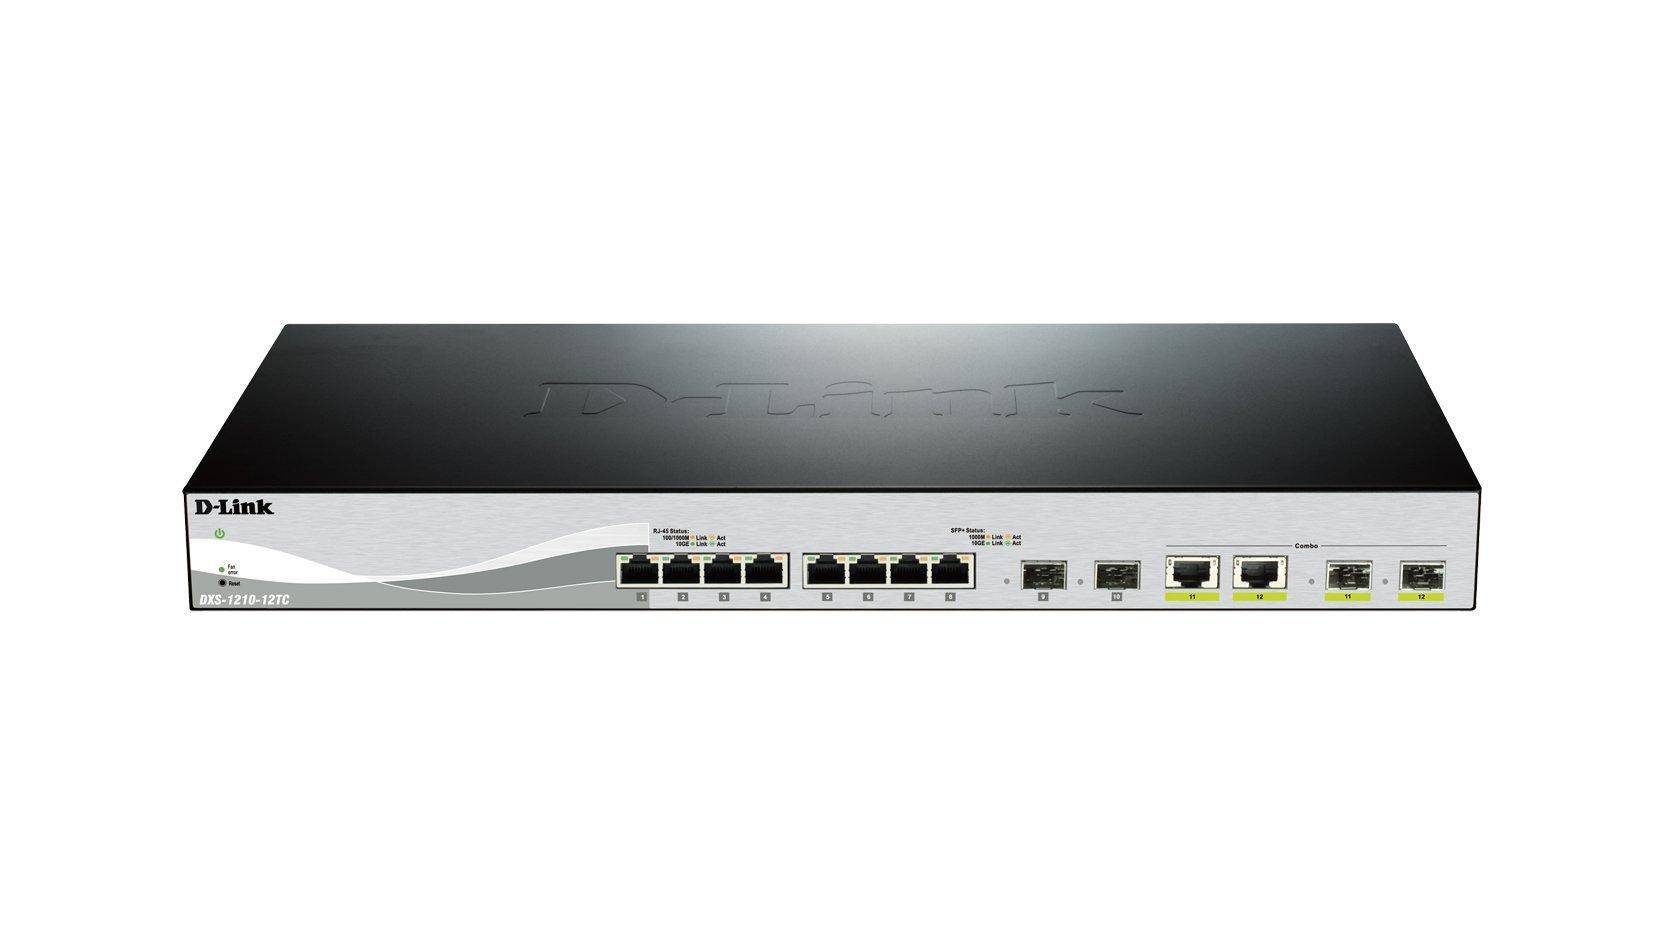 D-Link Systems 12-Port 10GBASE-T Web Smart Switch & 2 SFP+ Ports & 2 10GBASE-T/SFP+ Combo Ports (DXS-1210-12TC) by D-Link